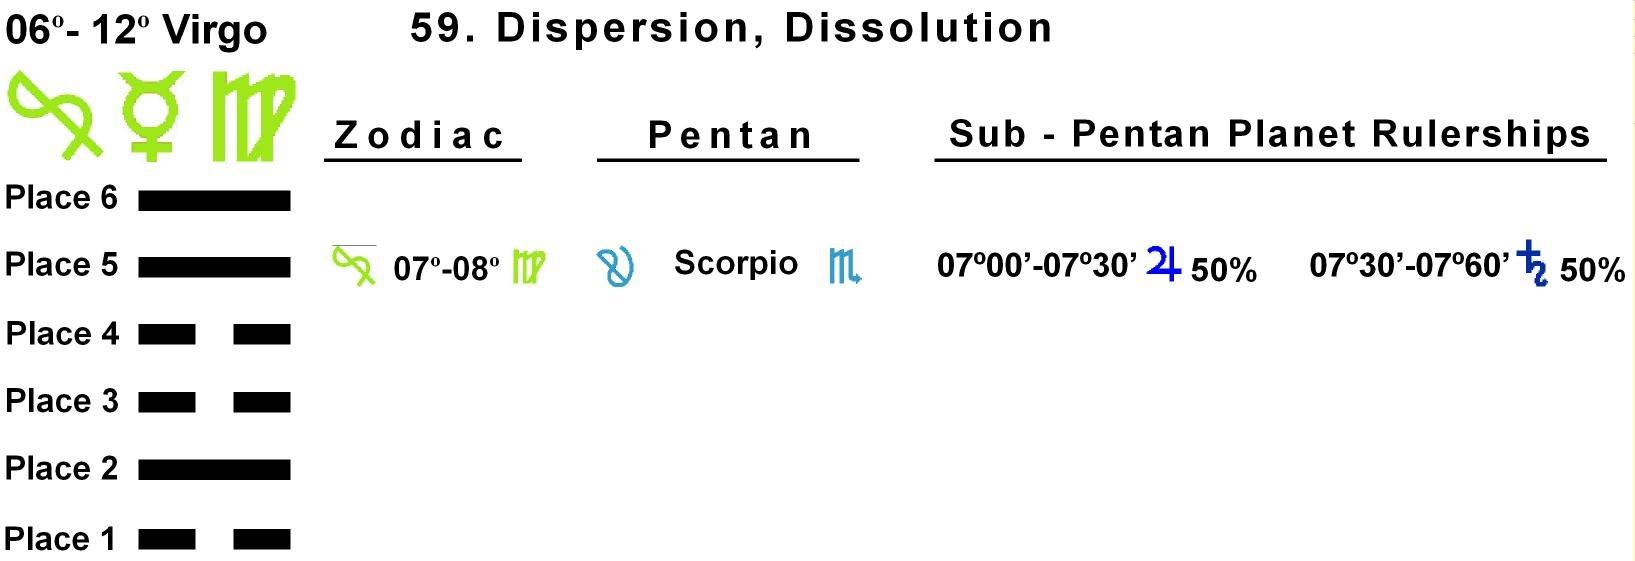 Pent-lines-06VI 07-08 Hx-59 Dispersion